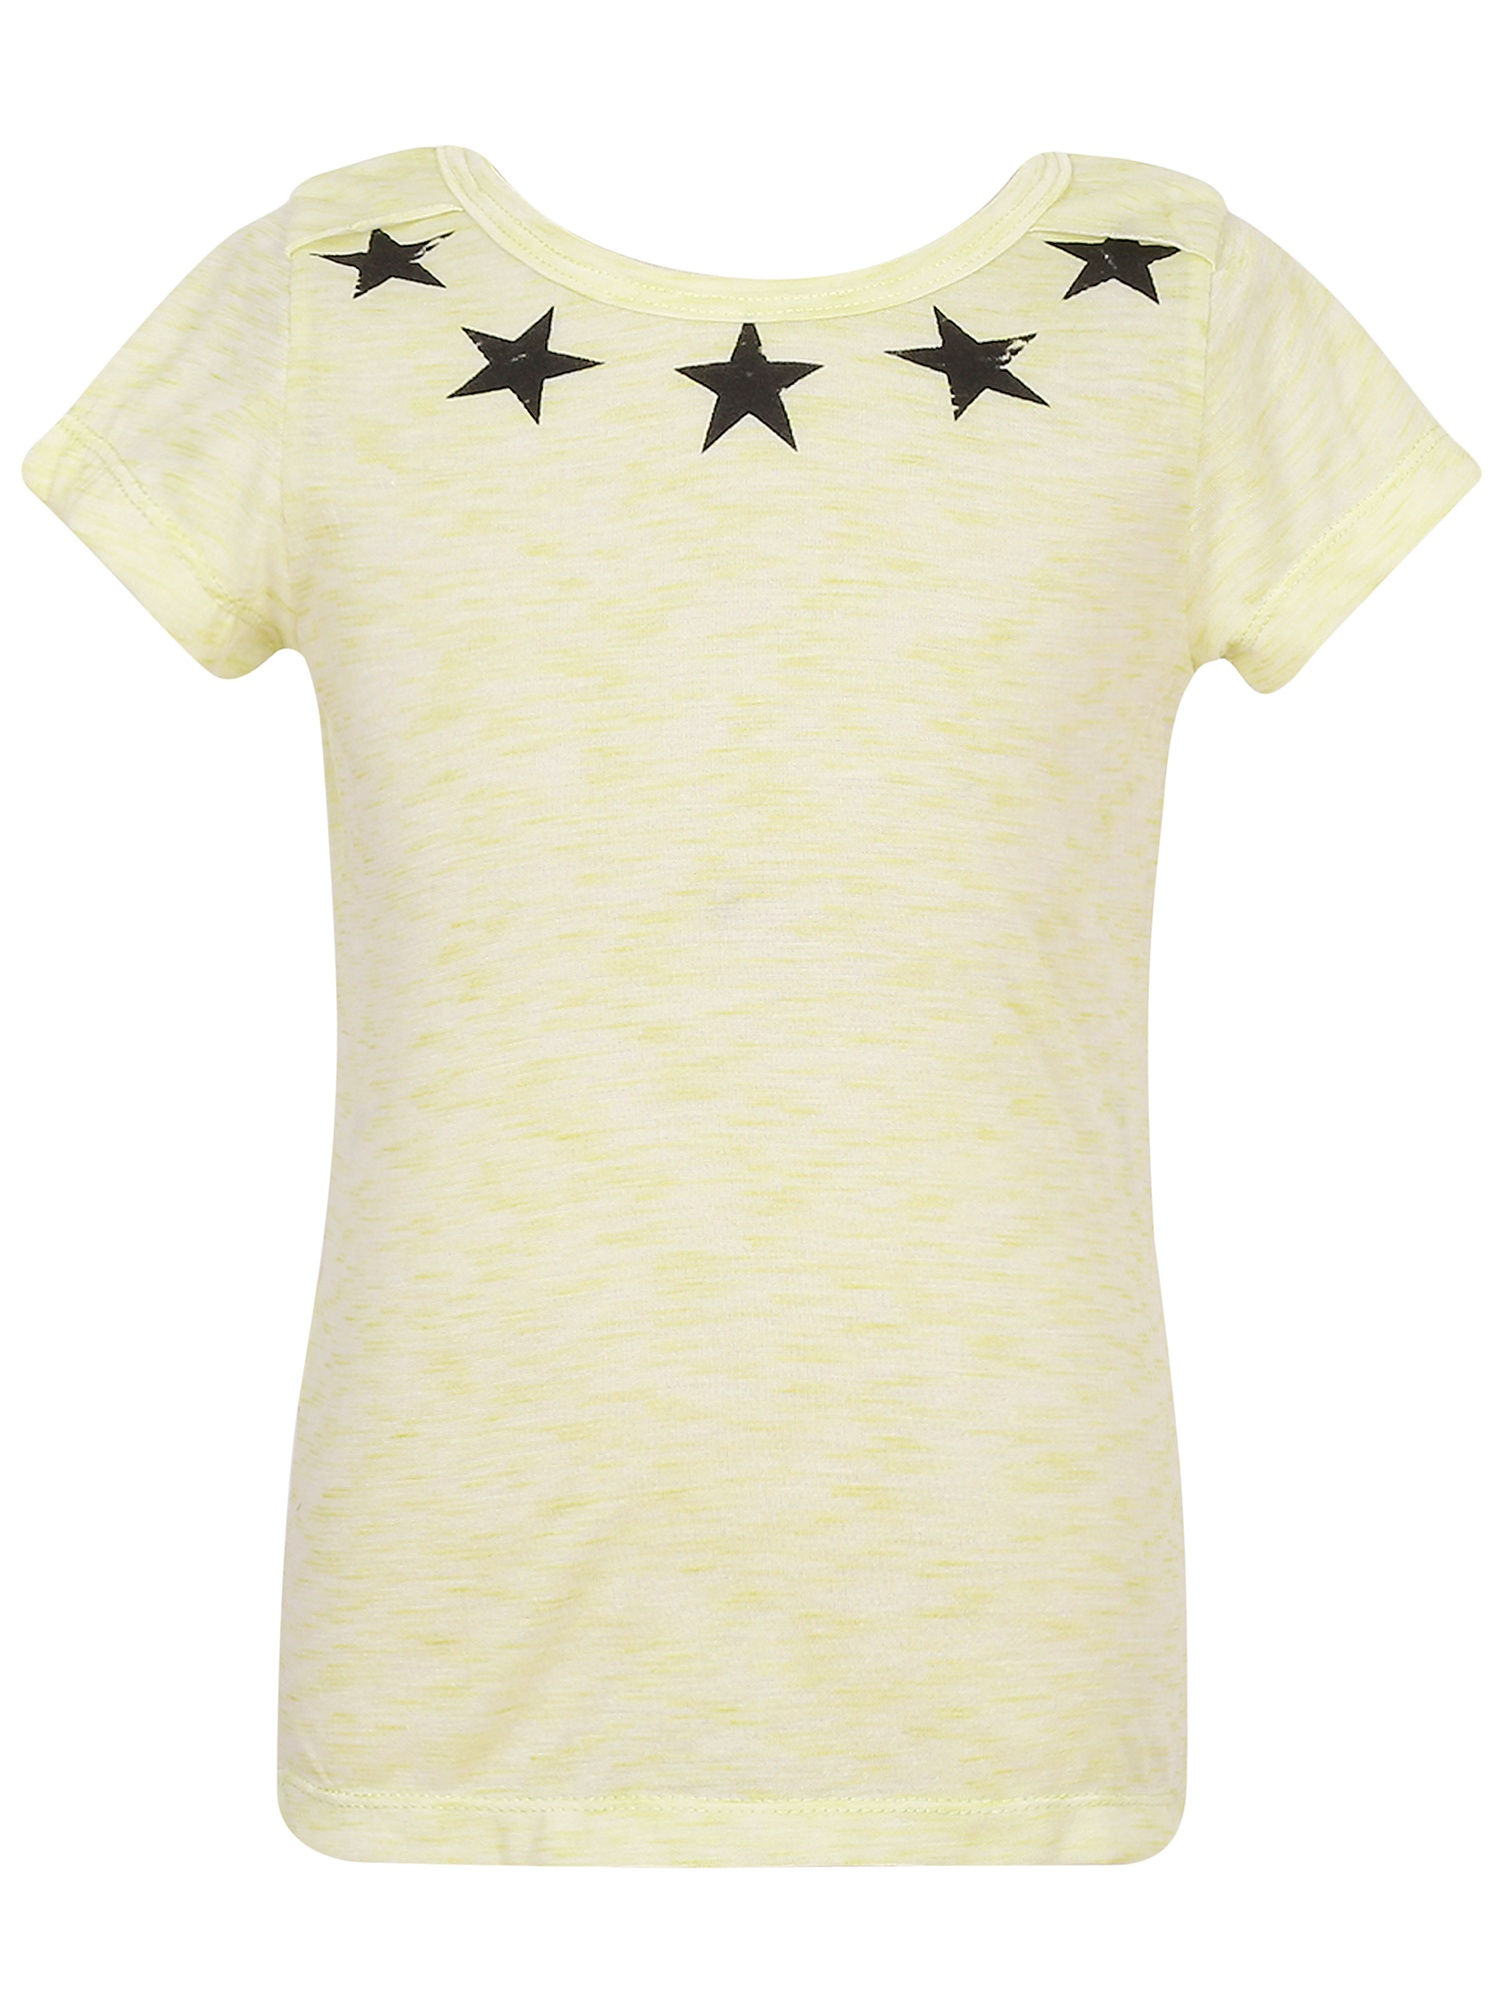 Richie House Girls' Summer Cotton T-shirt with Stars RH2422